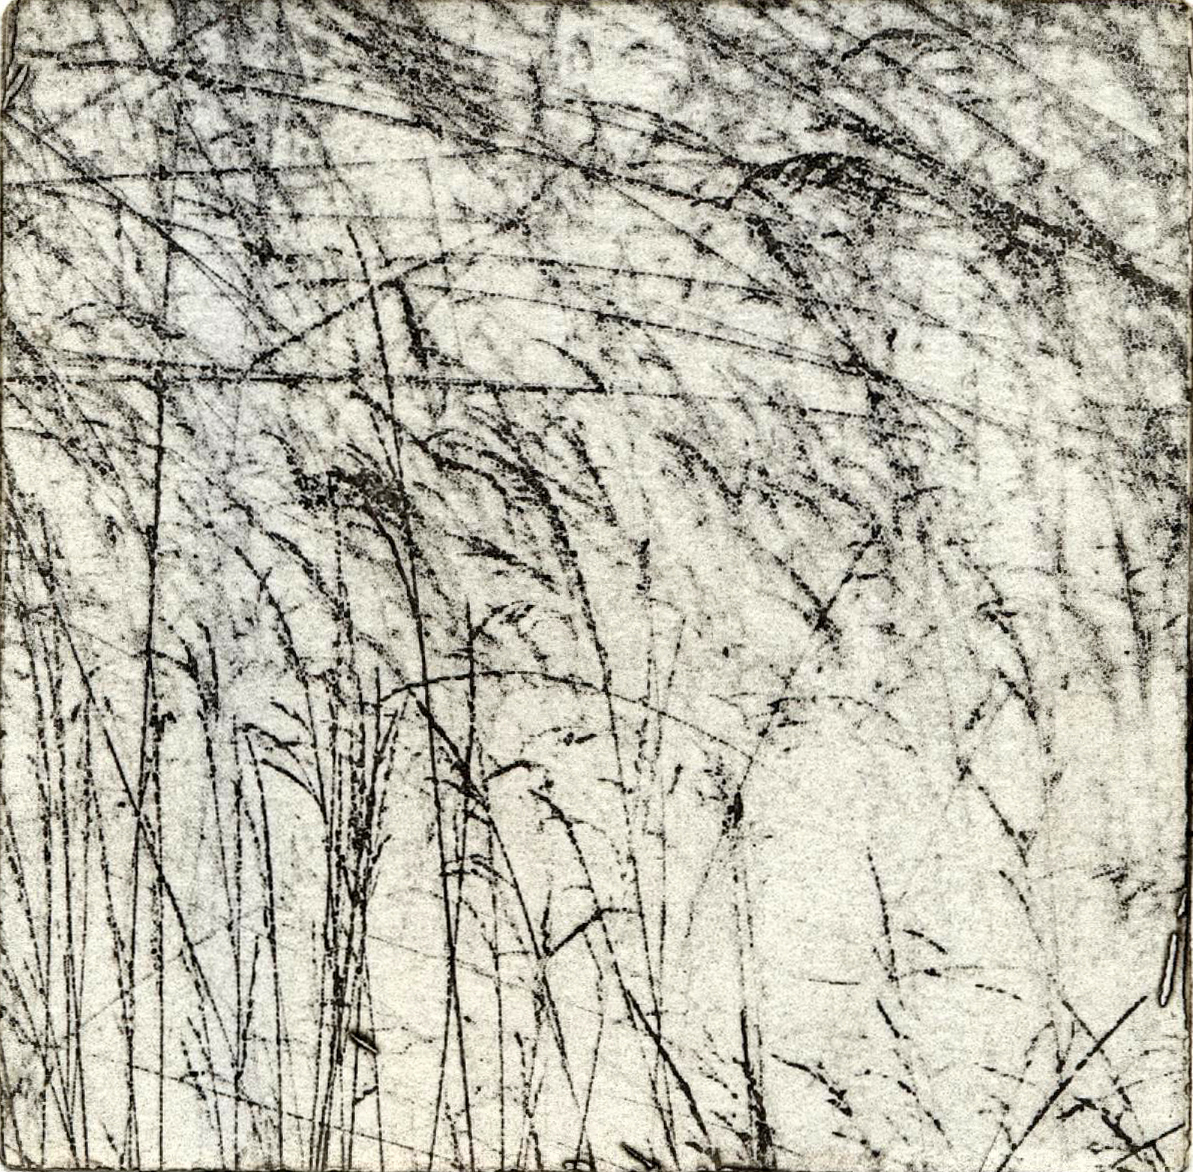 Sarah Roach - Trace - Photopolymer Etching - 10cm x 10cm